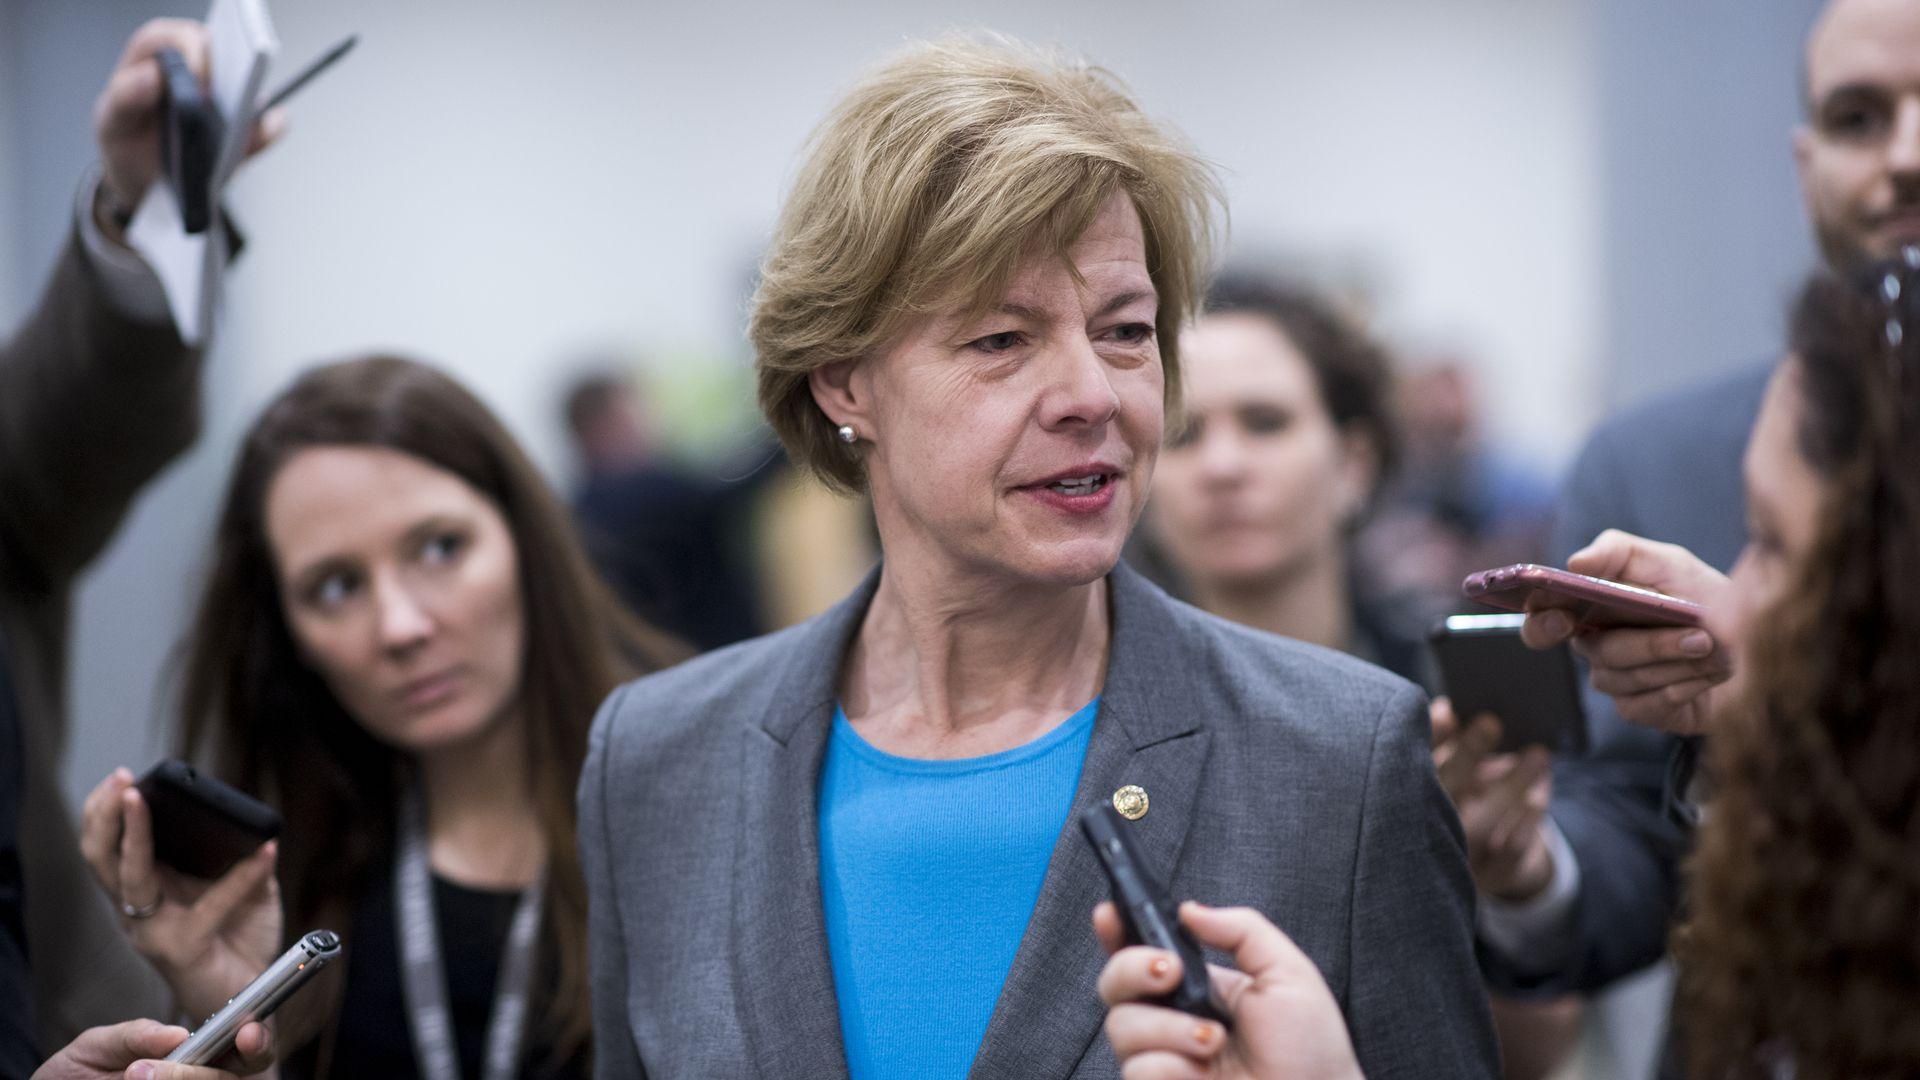 Senator Tammy Baldwin speaks to a group of reporters